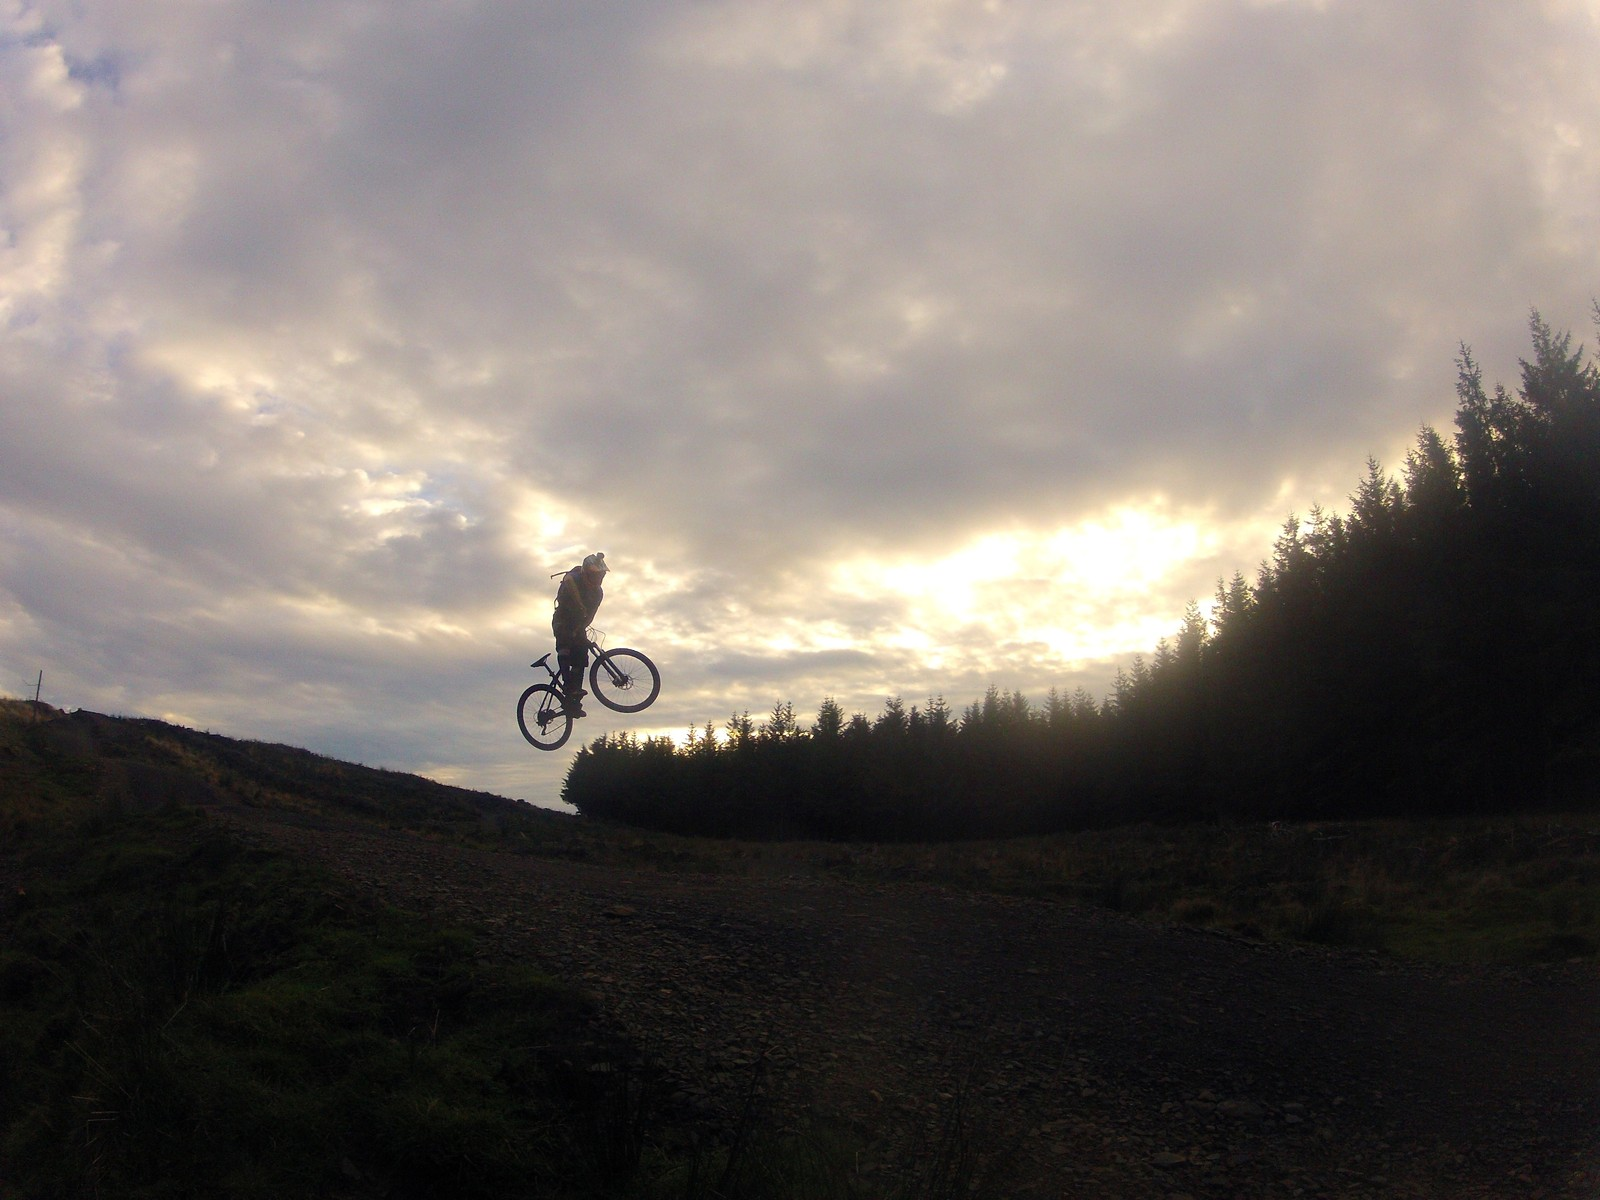 BPW 2014 - charles.livens - Mountain Biking Pictures - Vital MTB